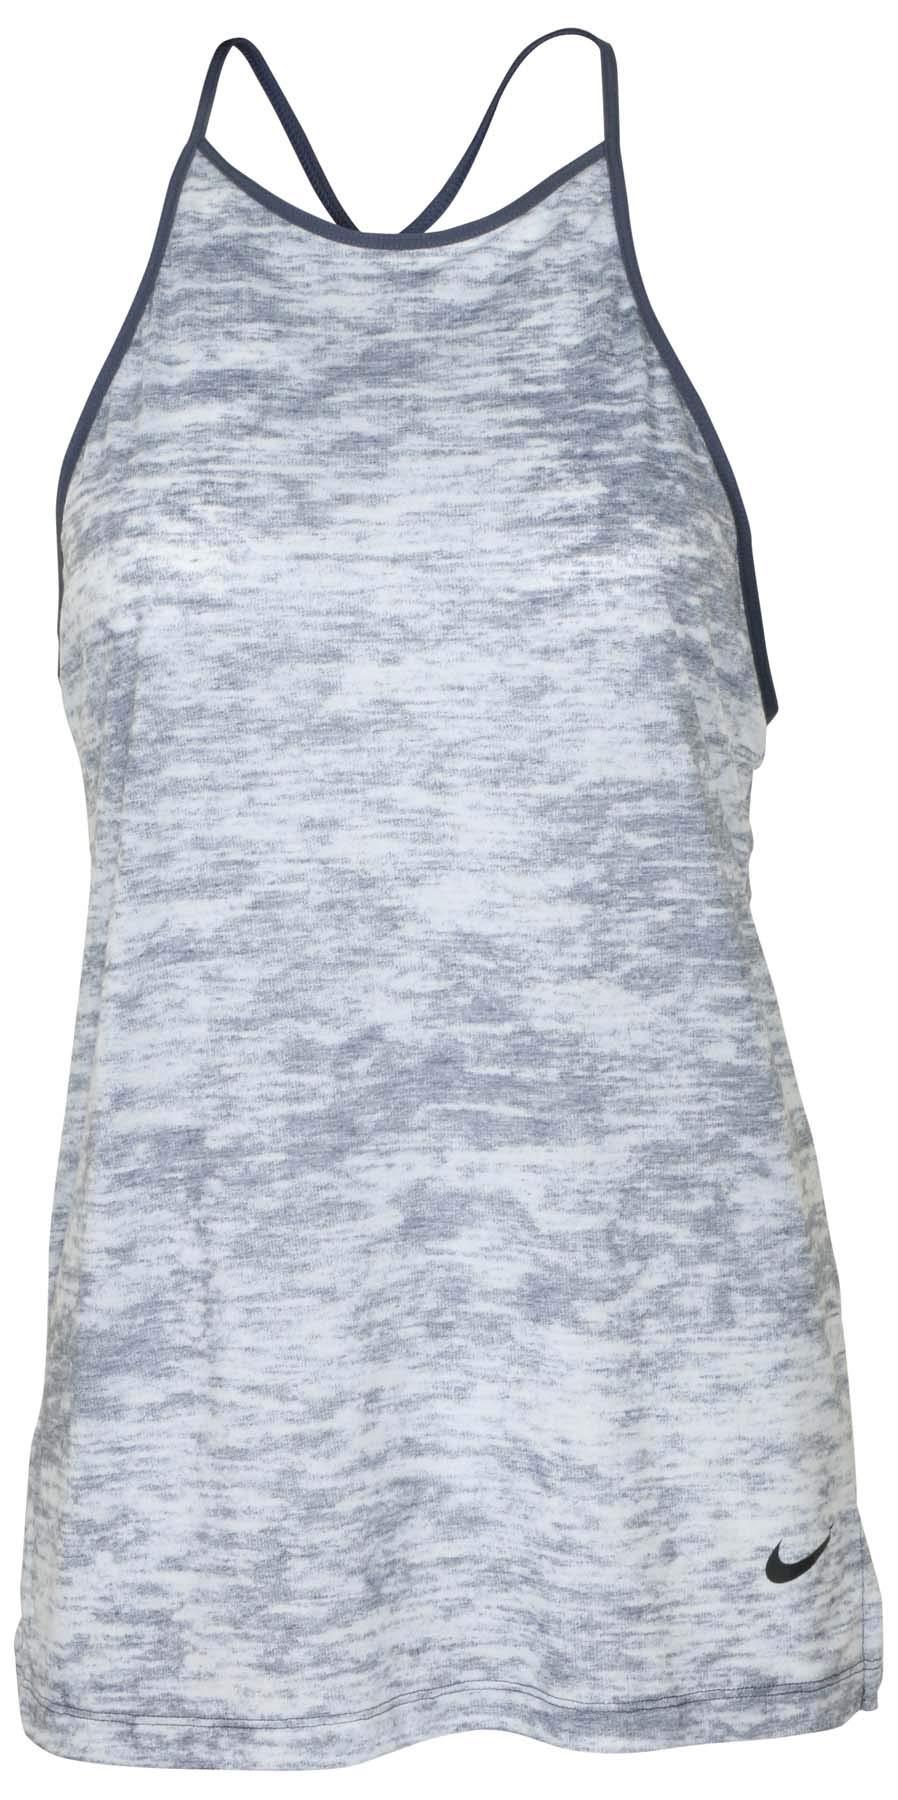 Nike Women's Breathe Loose Tank Top-Thunder Blue Heather-XS